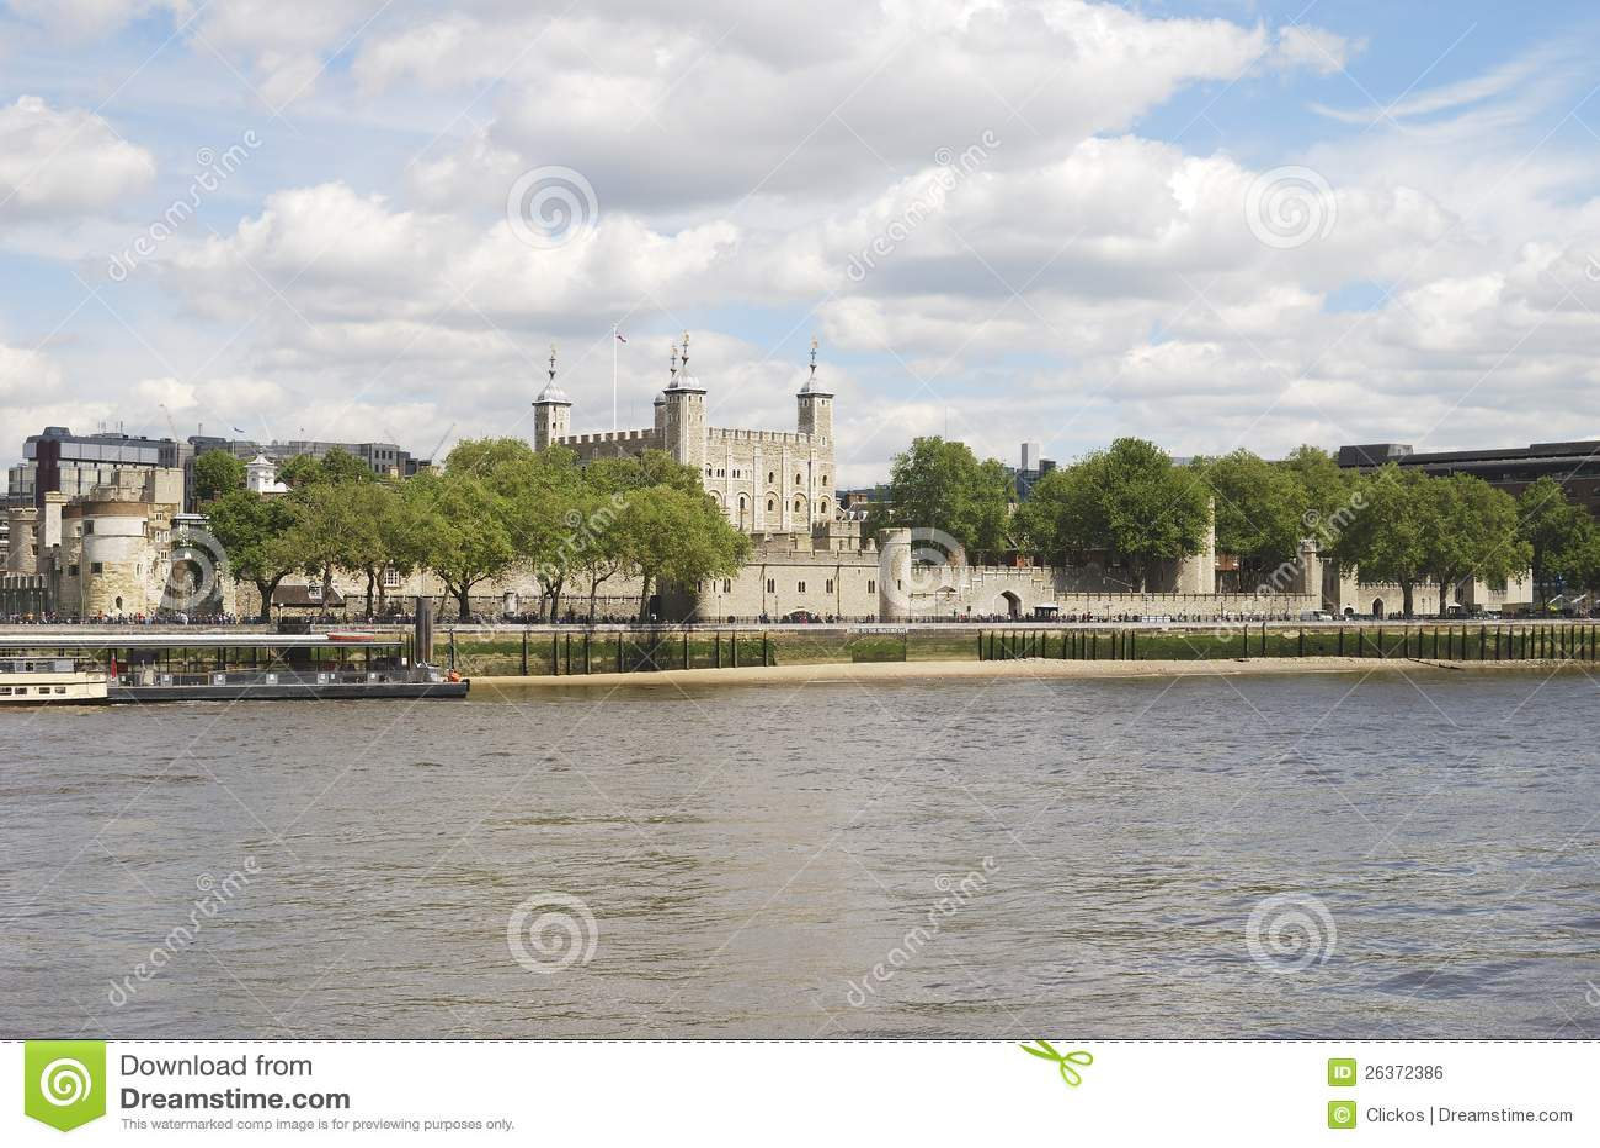 Башня Лондон. Англия